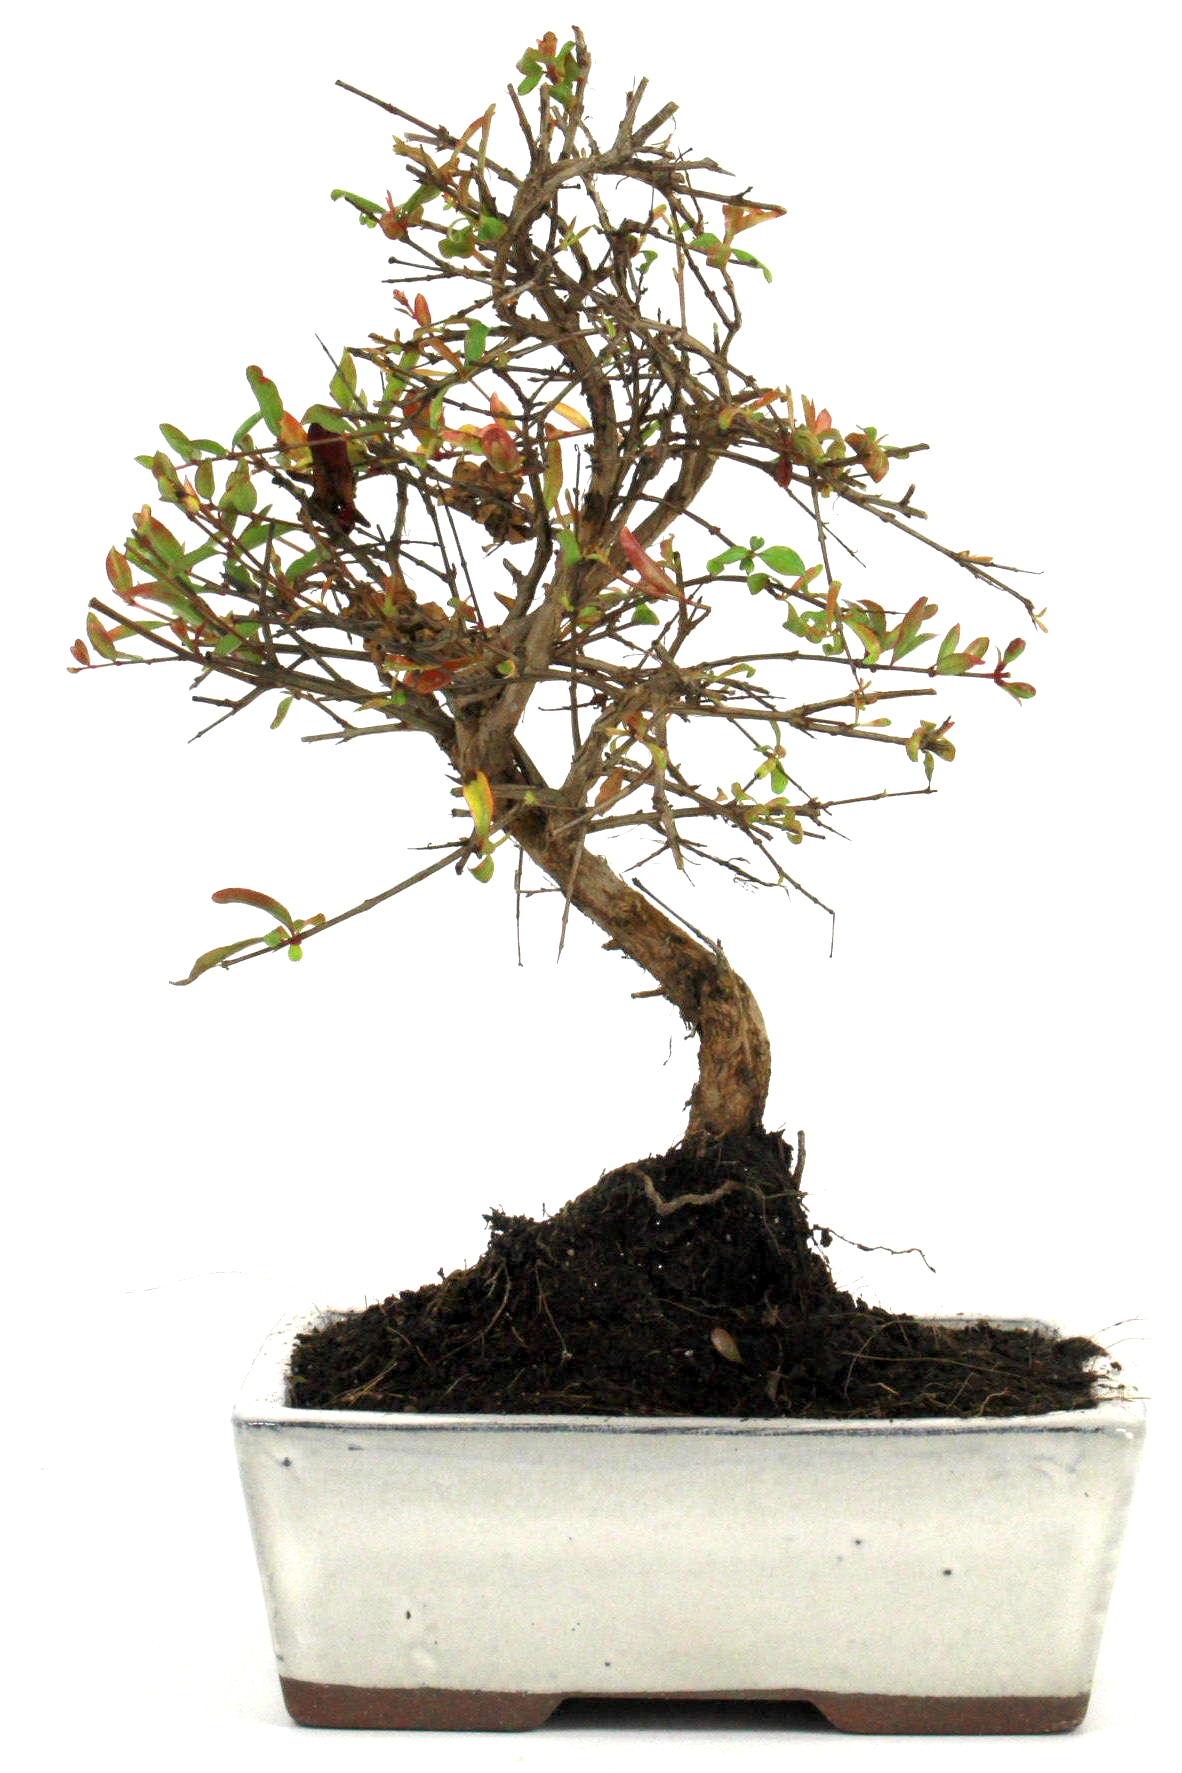 granatapfel bonsai 25 30 cm 161 bei oyaki bonsai kaufen. Black Bedroom Furniture Sets. Home Design Ideas